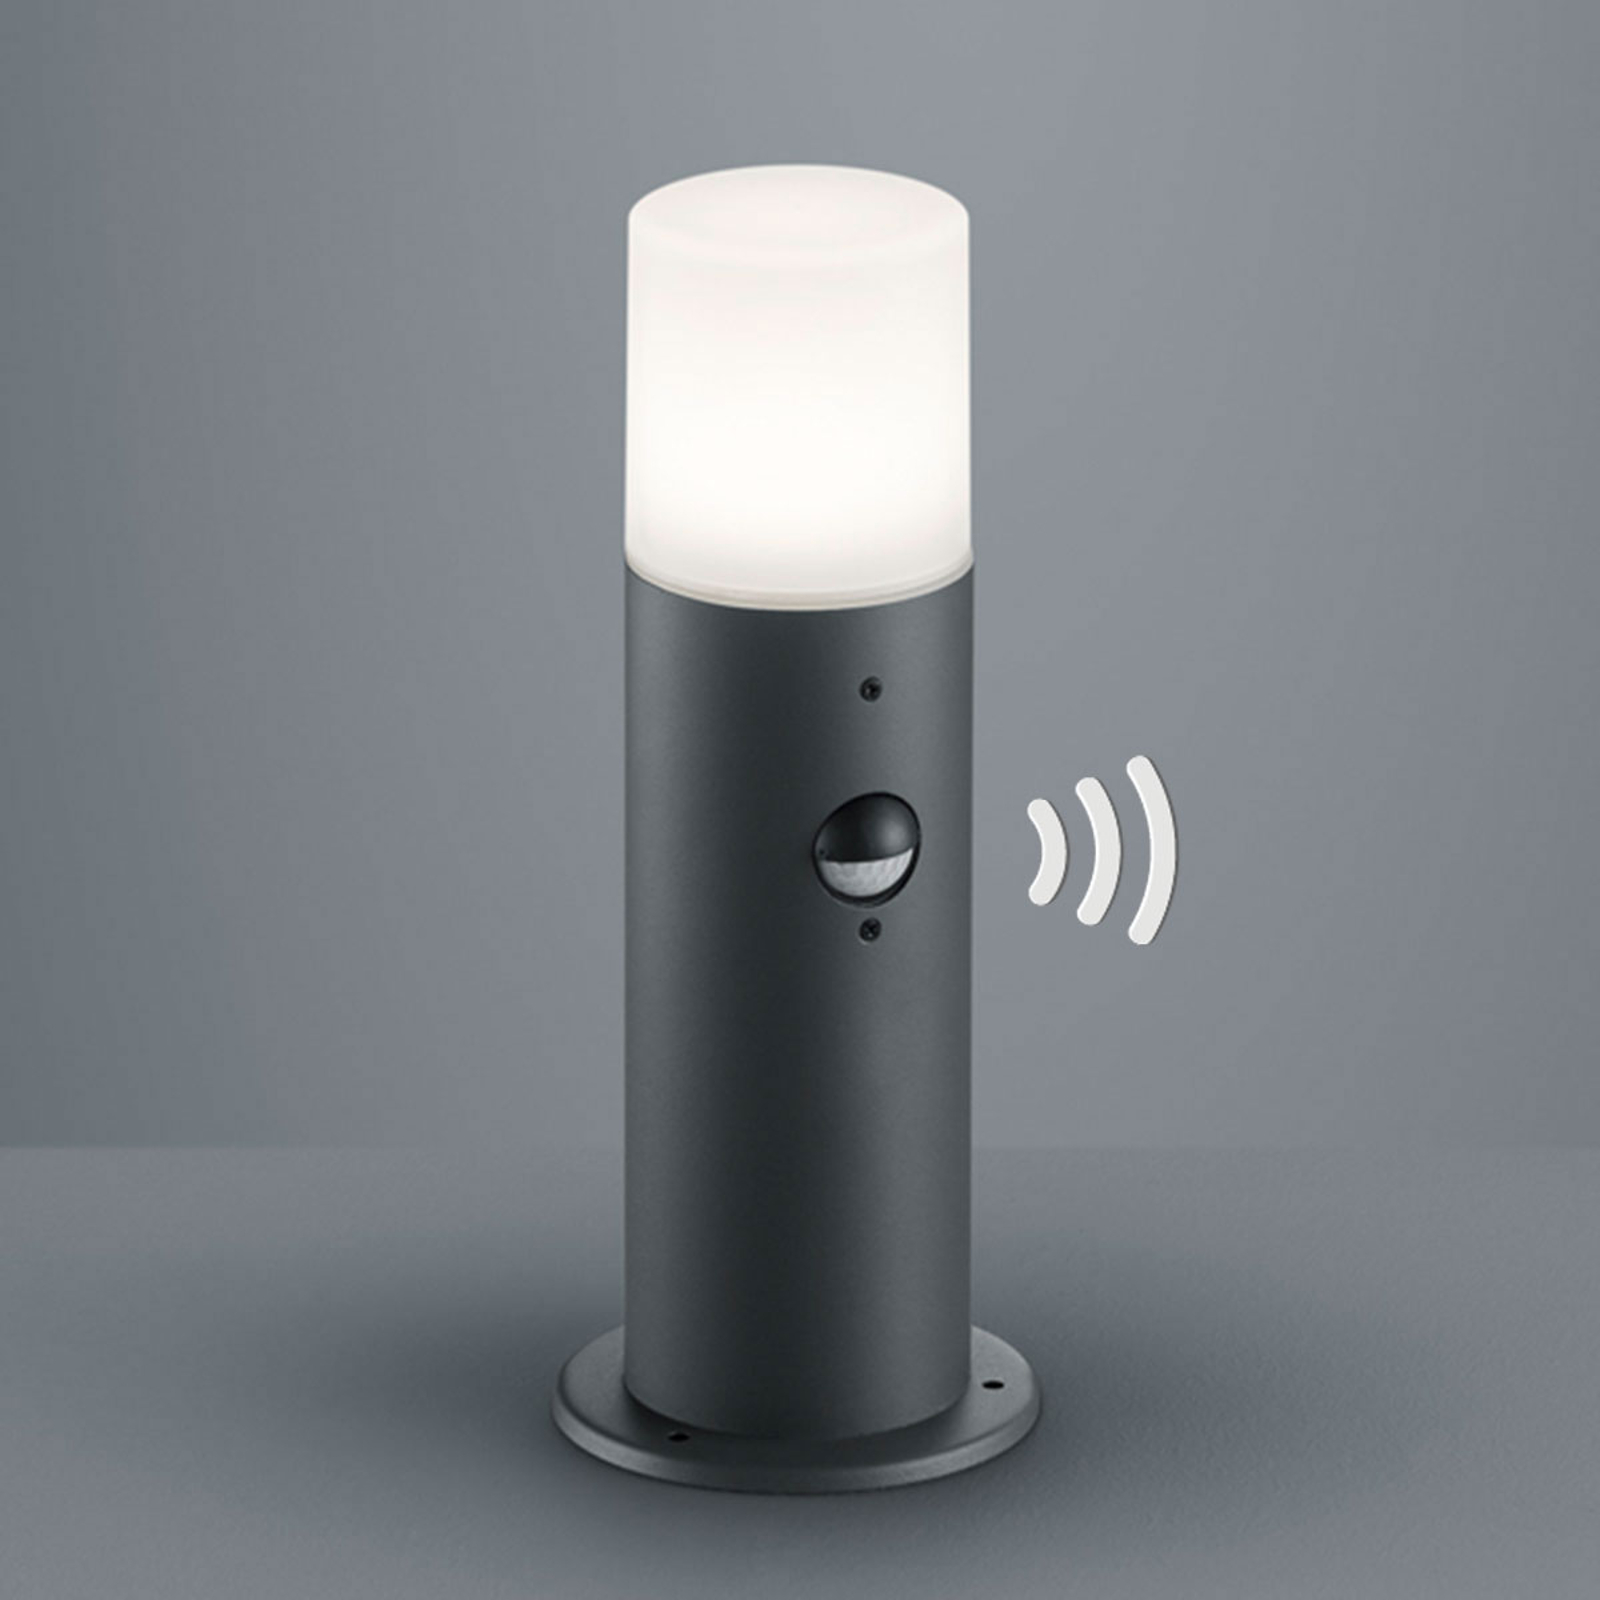 Lampioncino Hoosic in antracite con sensore